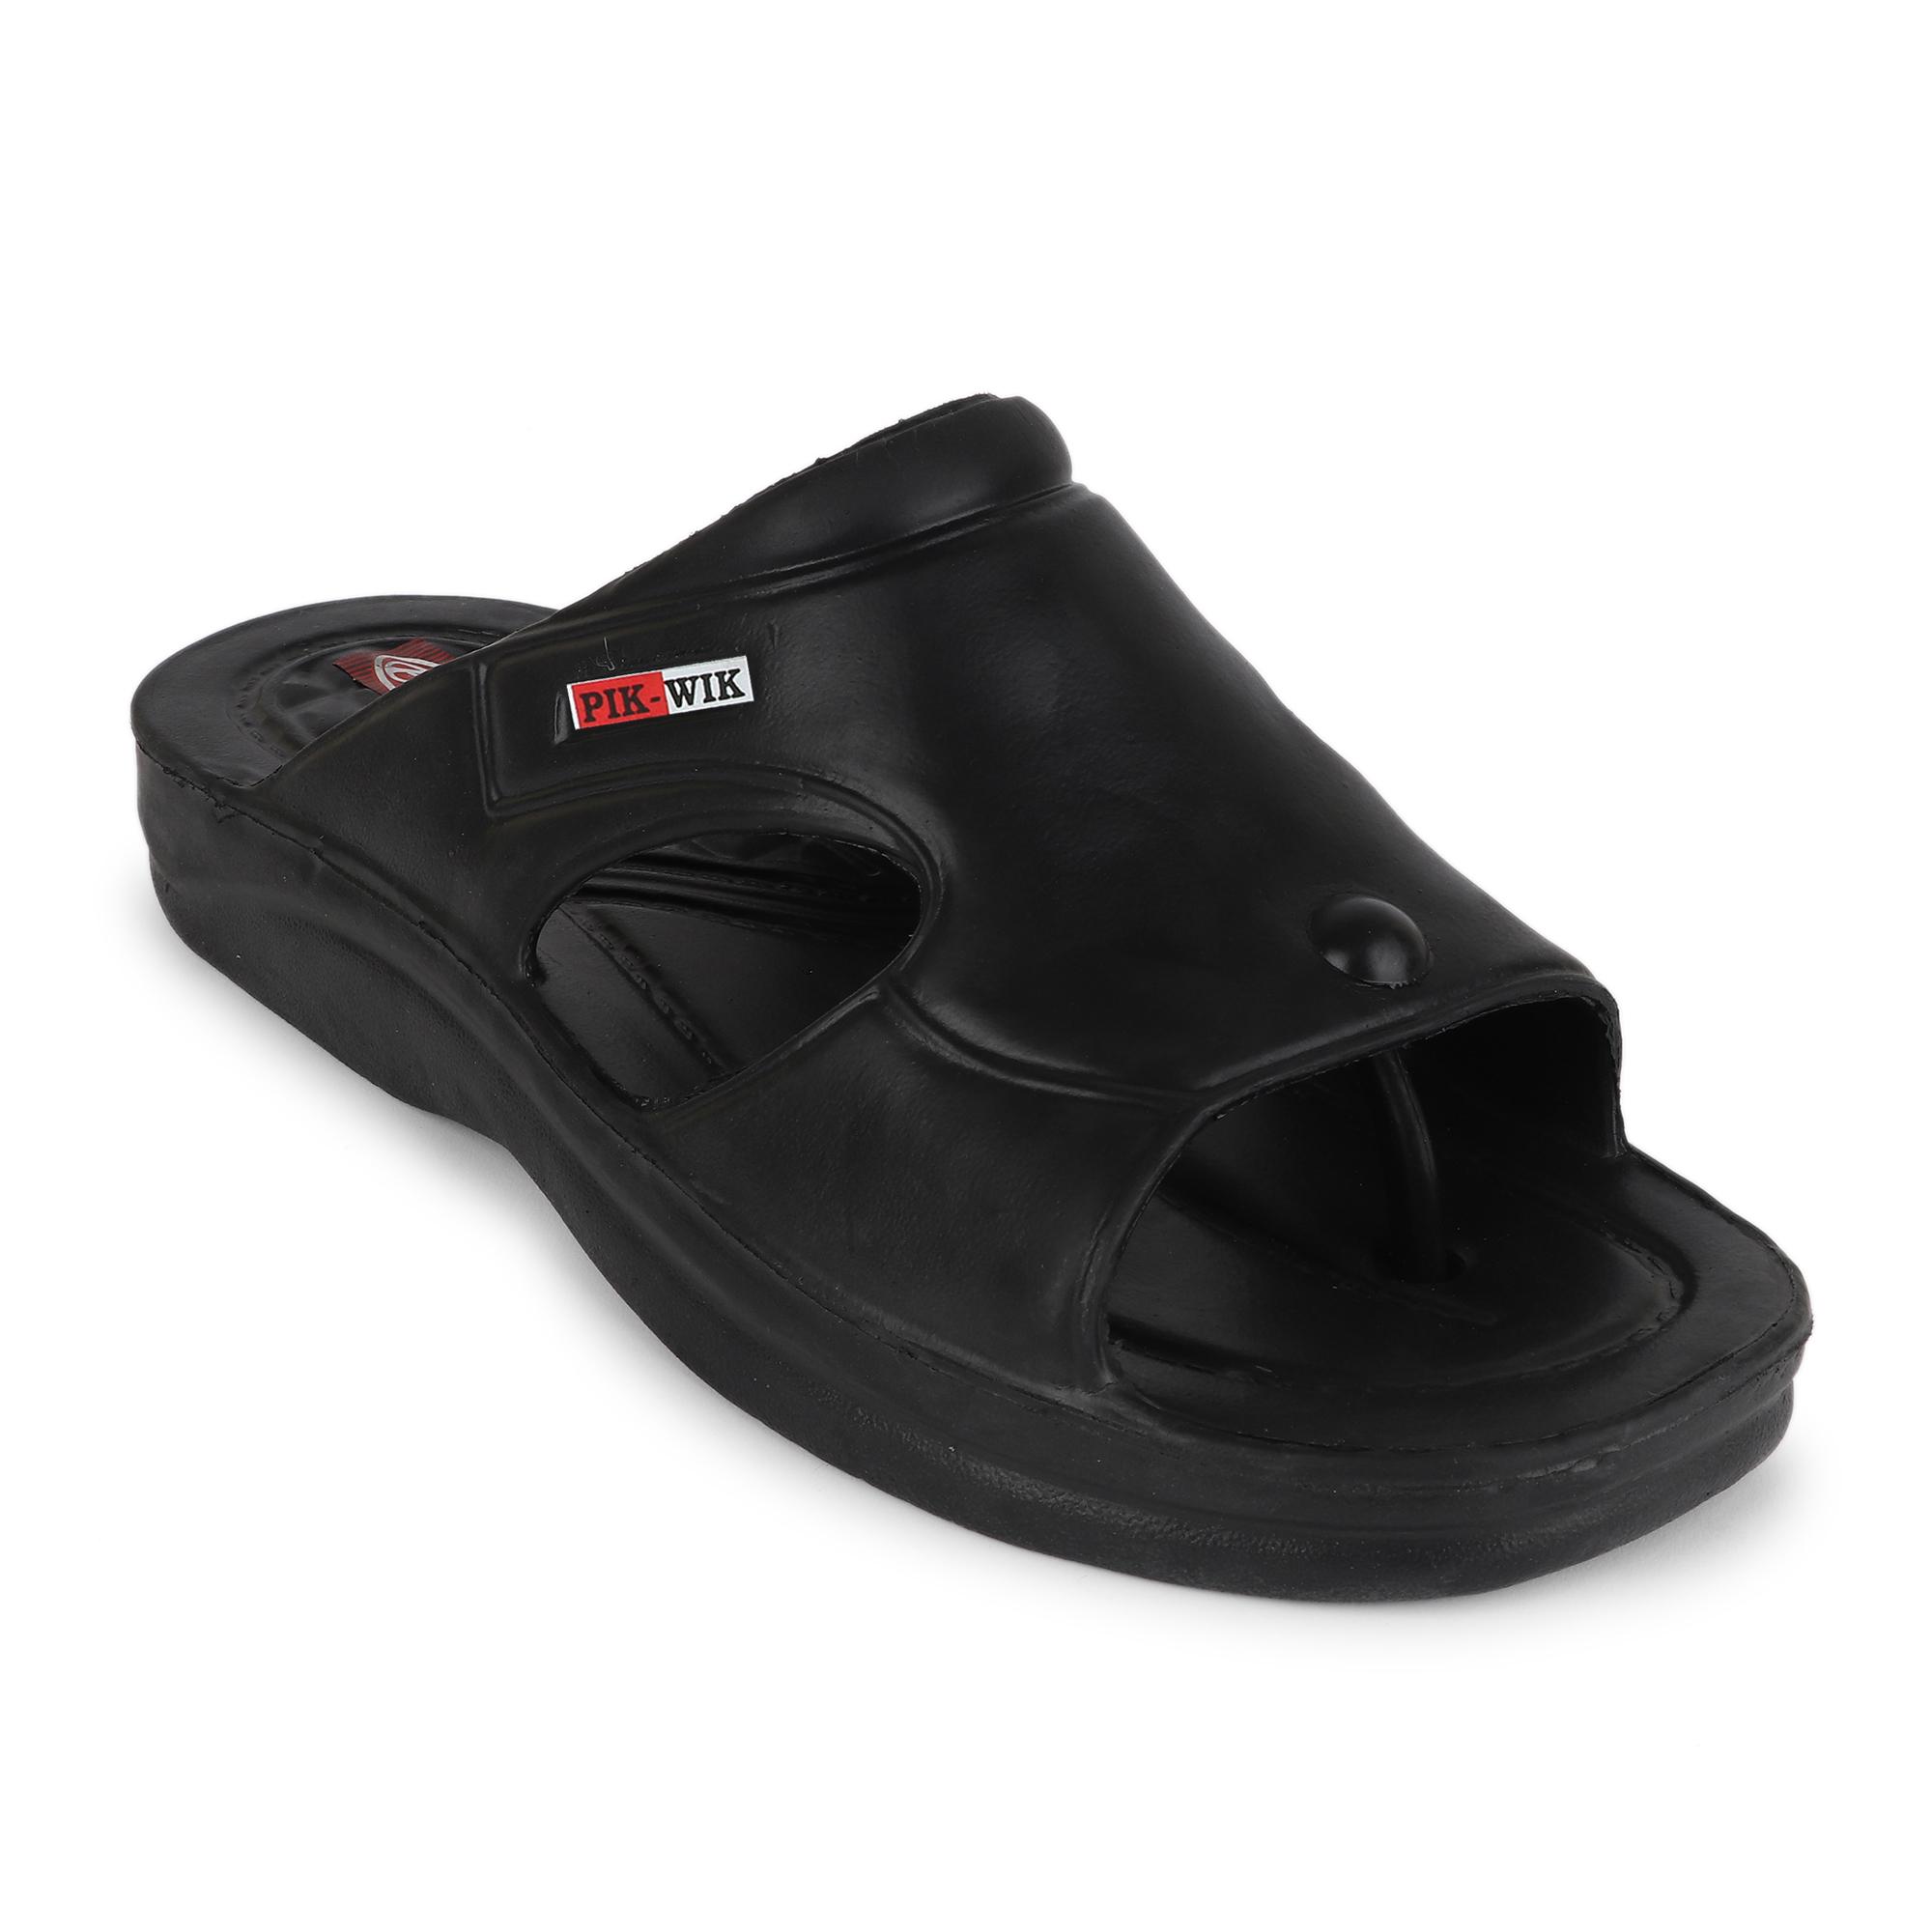 Light Weight Comfort Slipper - IPL